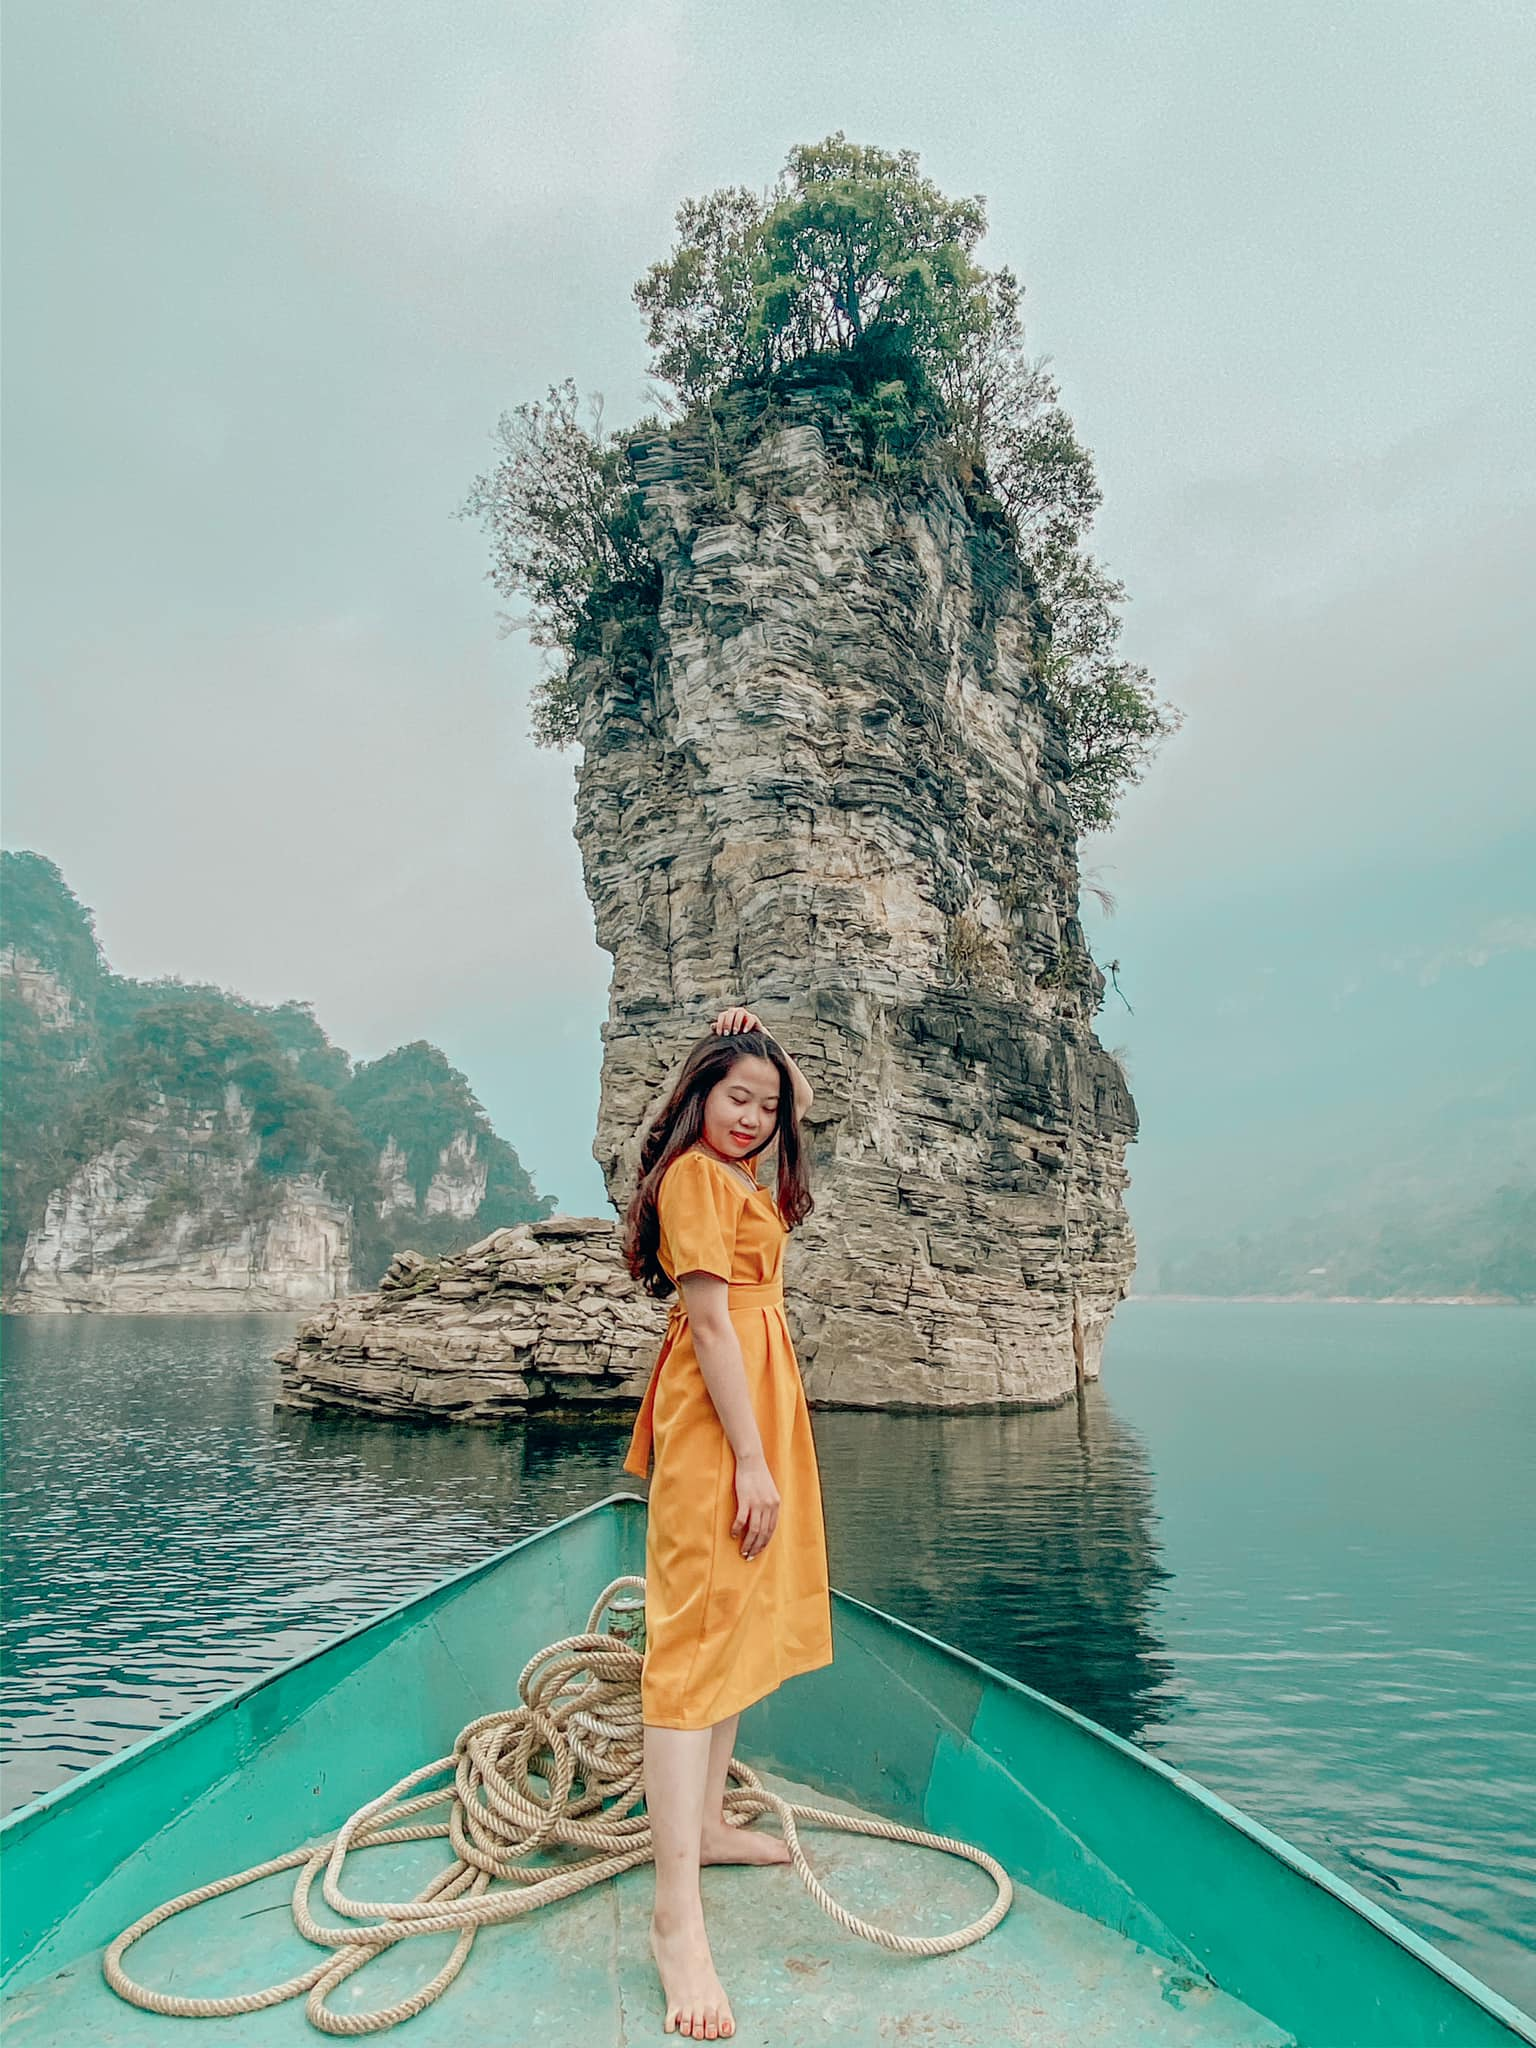 Tong-hop-nhung-dia-diem-du-lich-nui-hot-nhat-trong-dip-30-thang-4-vietmountain-travel187